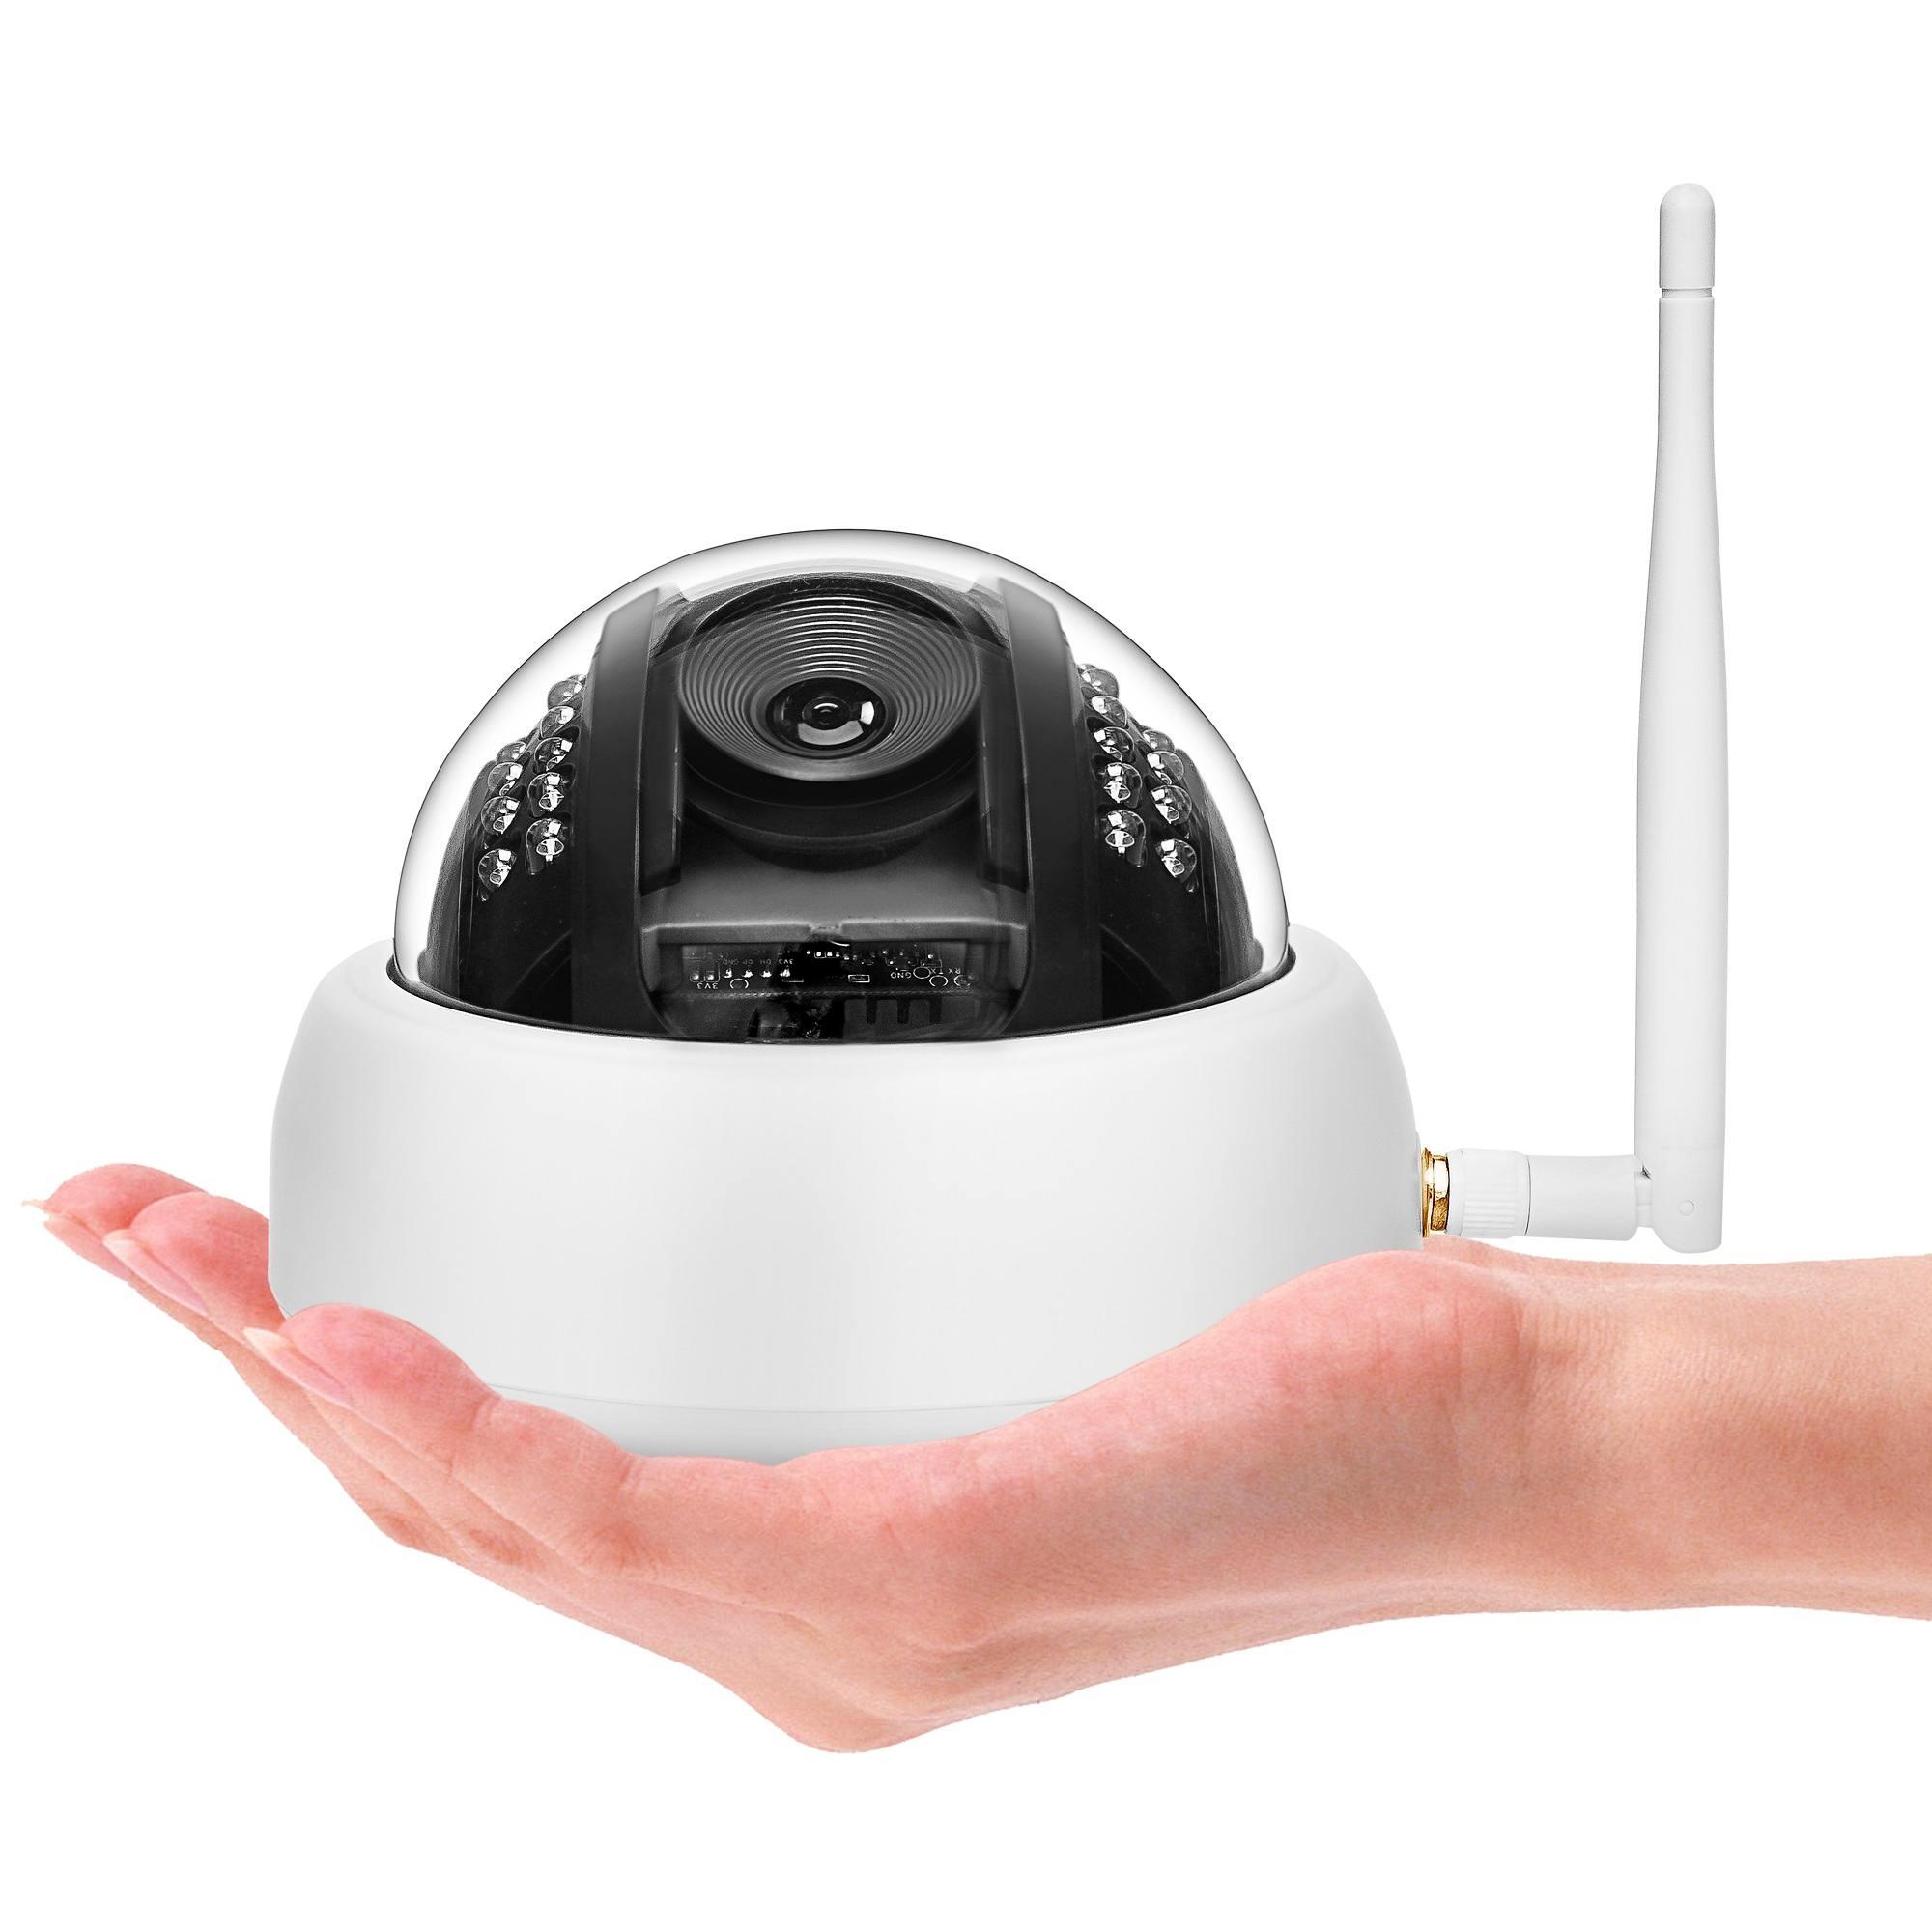 D25W 200W Pixels Wifi Wireless IP Camera CMOS Image Sensor Card Audio Listening Small Hemisphere Security Surveillance CameraD25W 200W Pixels Wifi Wireless IP Camera CMOS Image Sensor Card Audio Listening Small Hemisphere Security Surveillance Camera